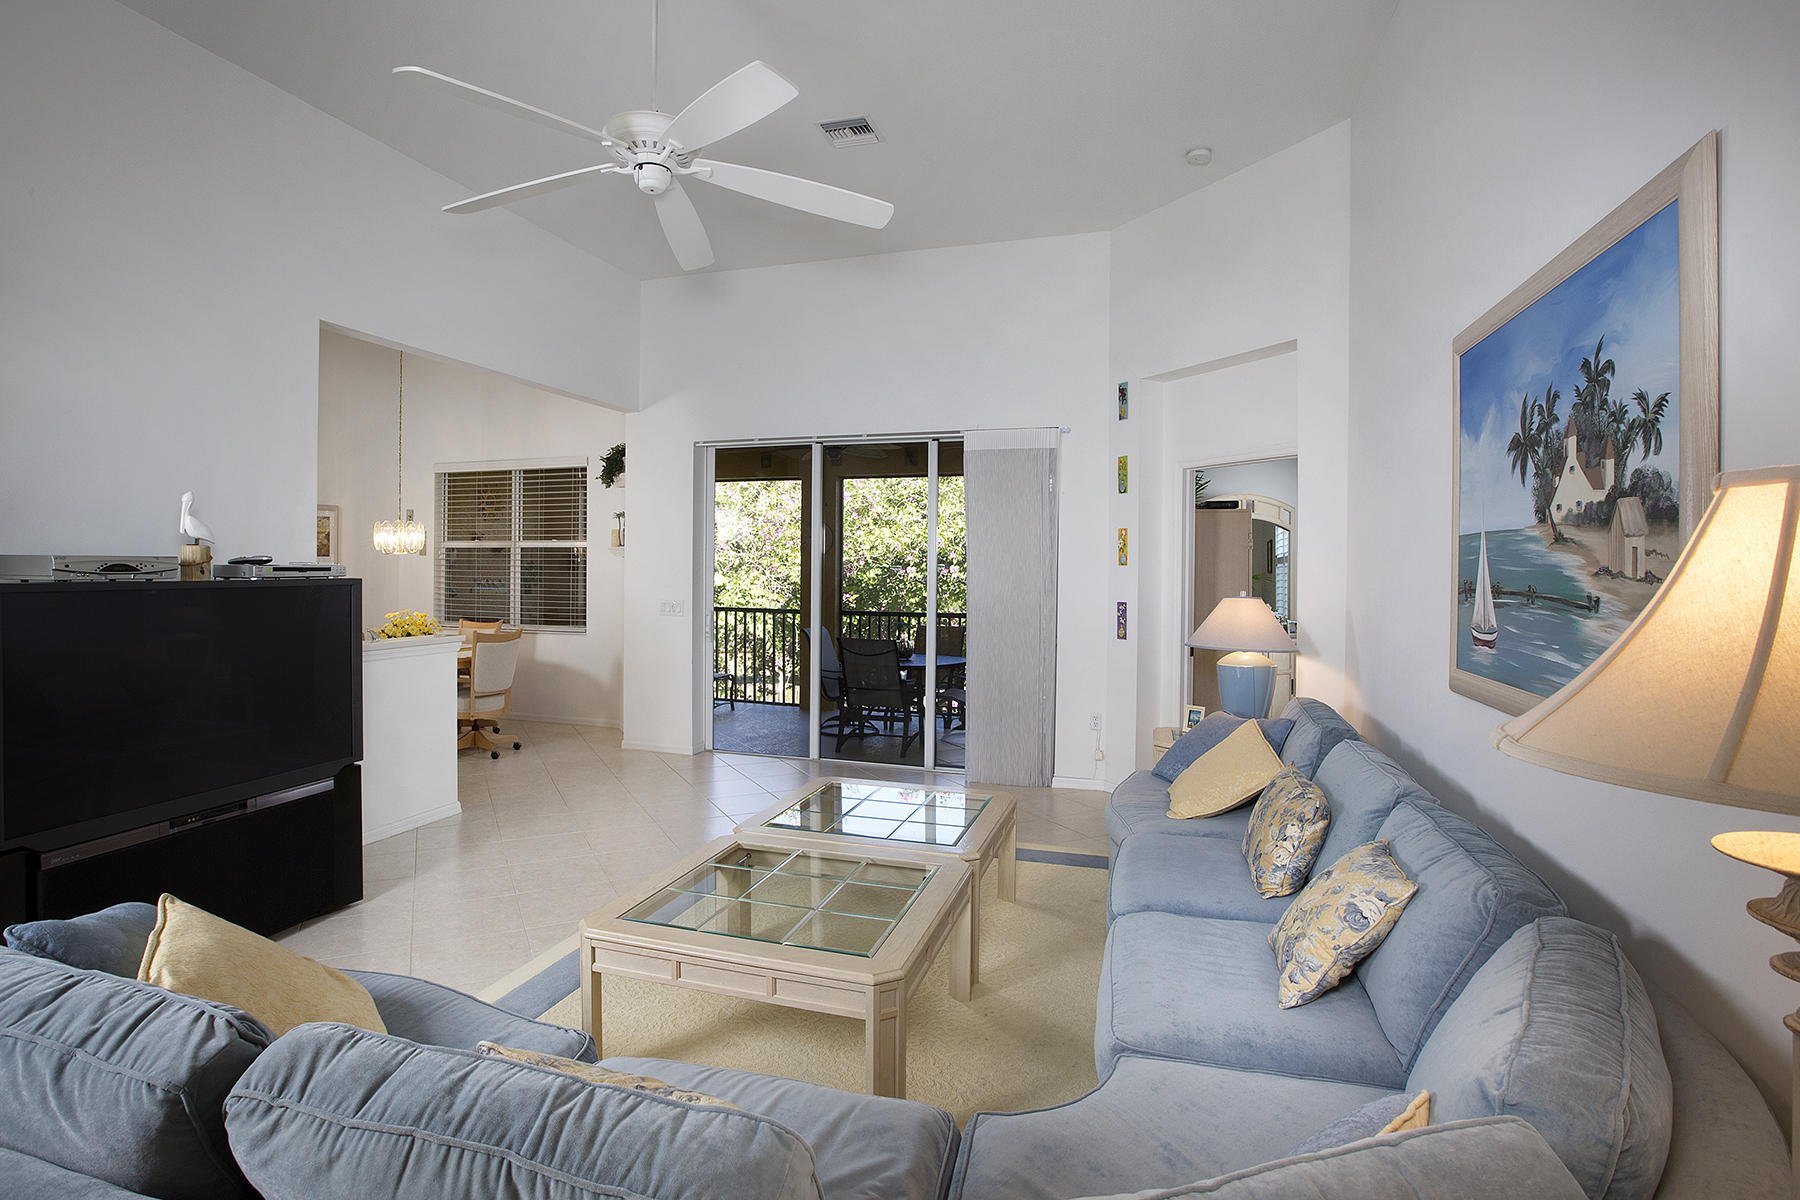 Condominium for Sale at TOSCANA AT VASARI 12259 Toscana Way 202 Bonita Springs, Florida, 34135 United States